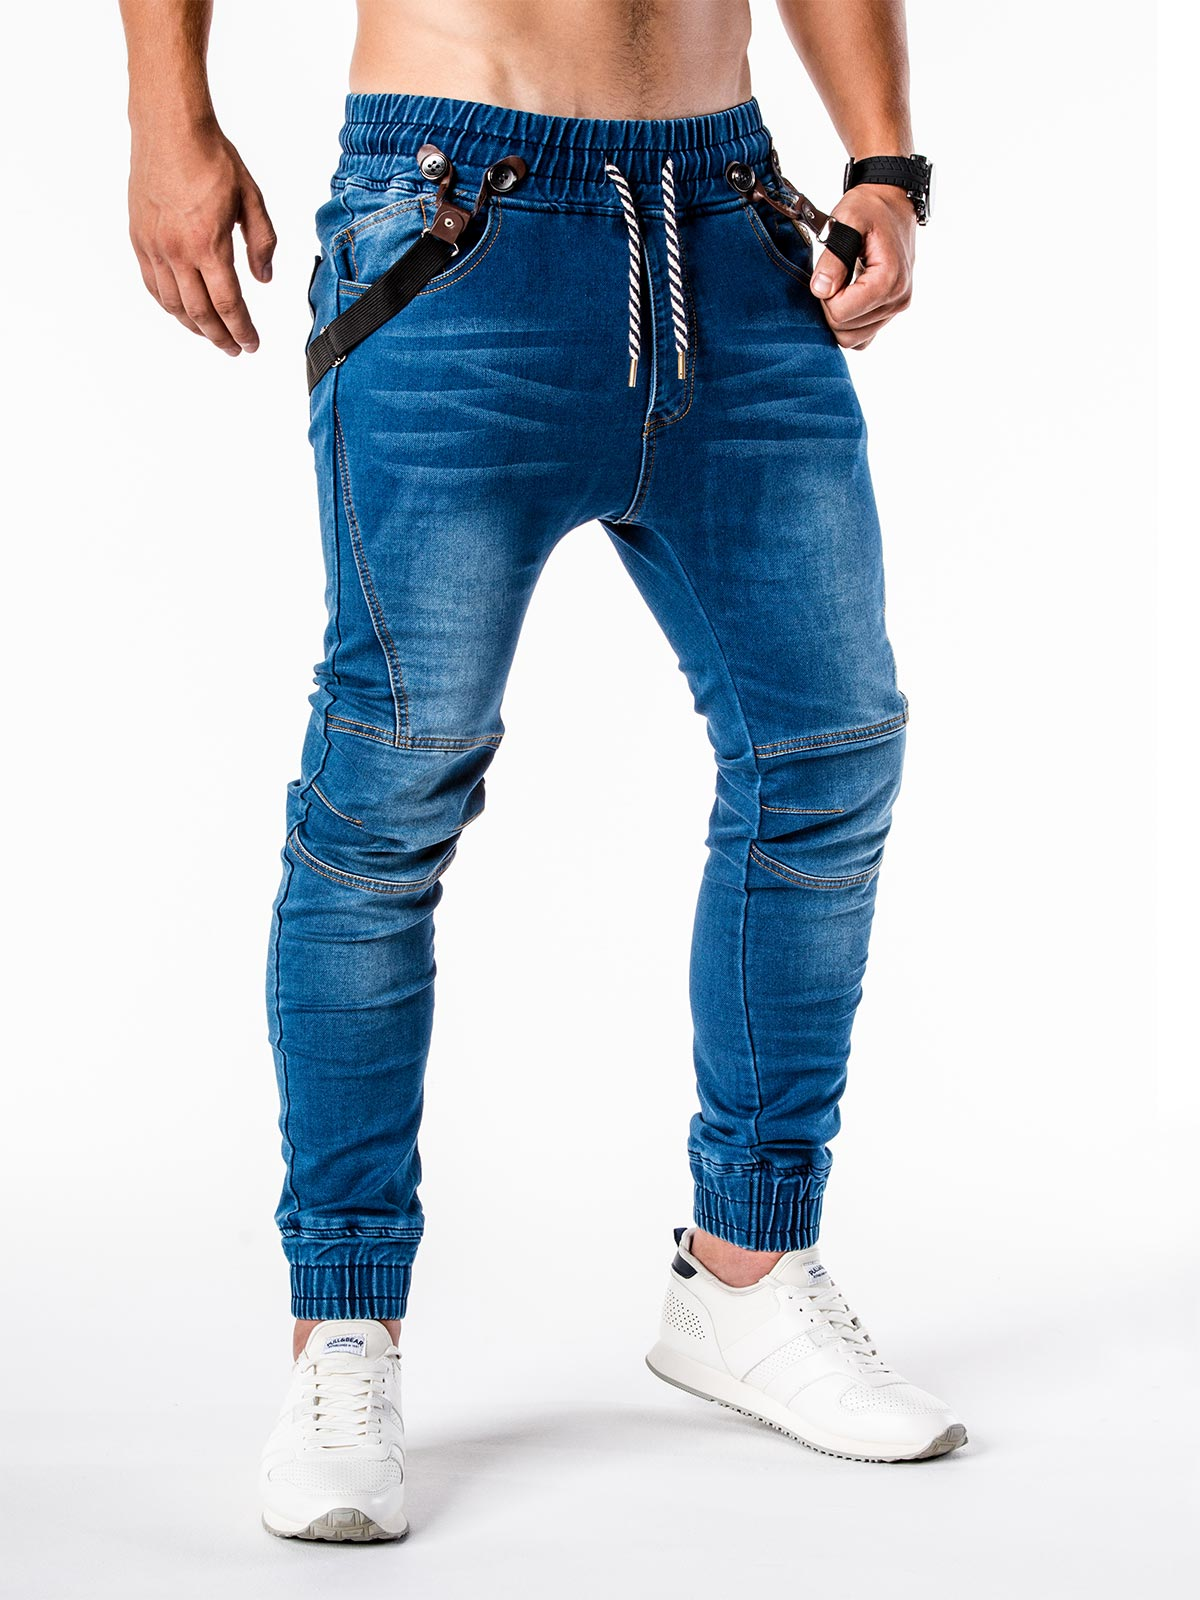 Ombre Clothing Men's jeans joggers P448